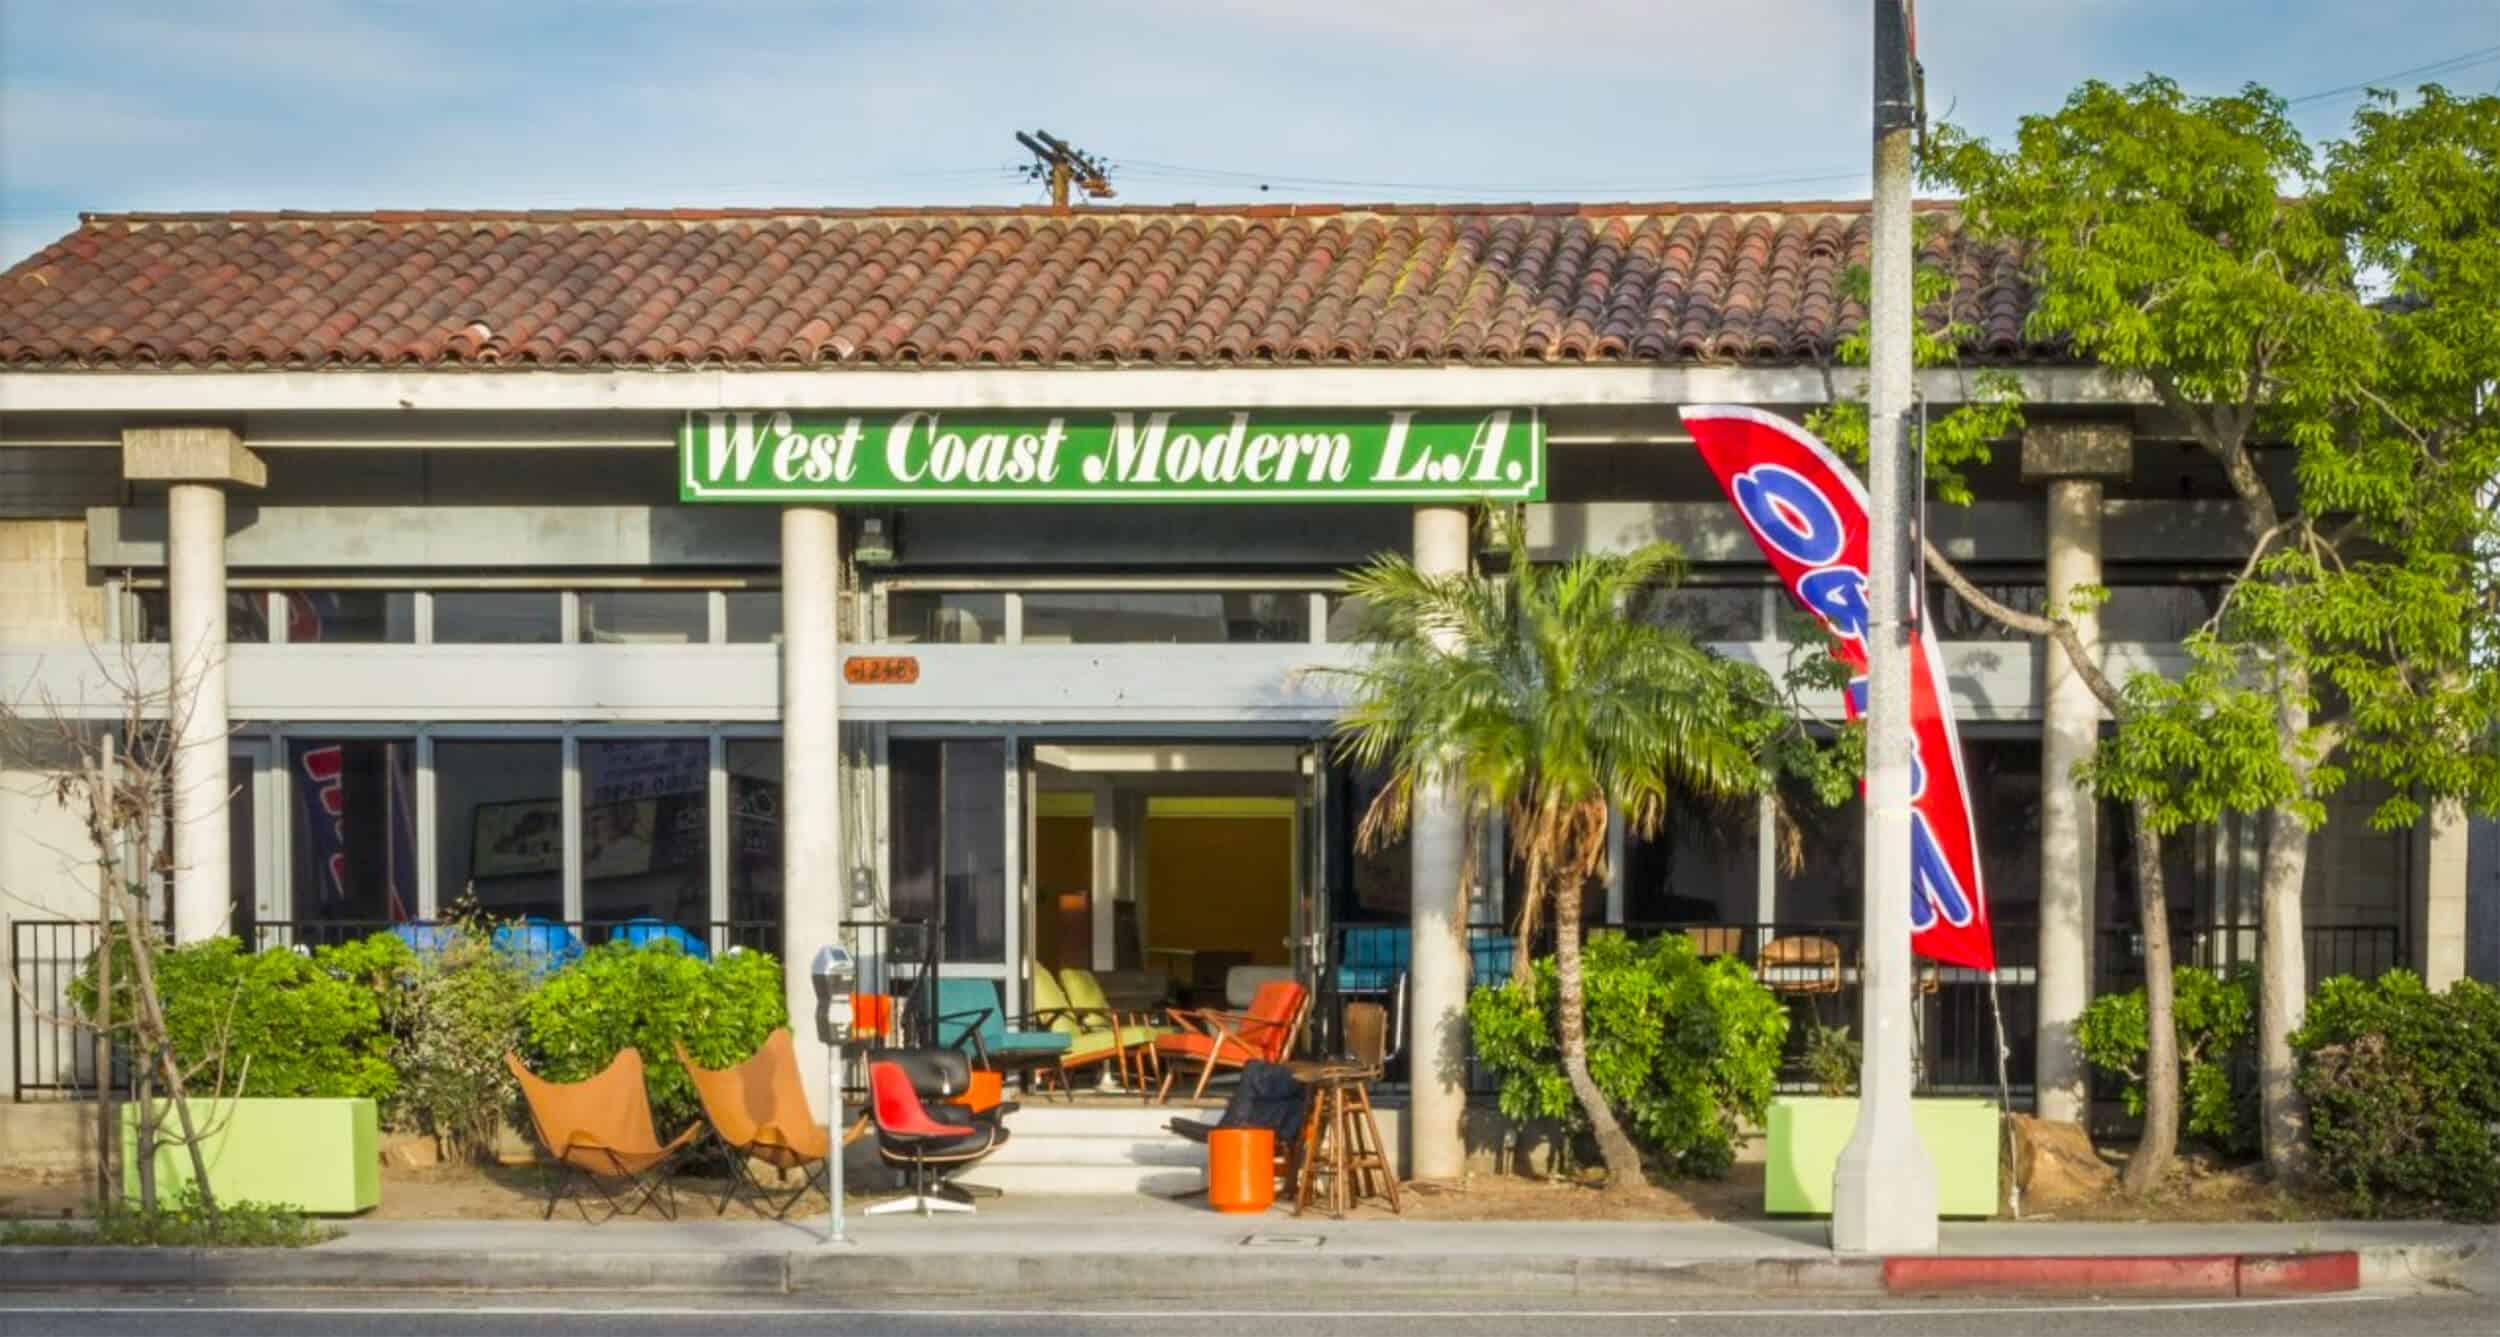 West Coast Modern La